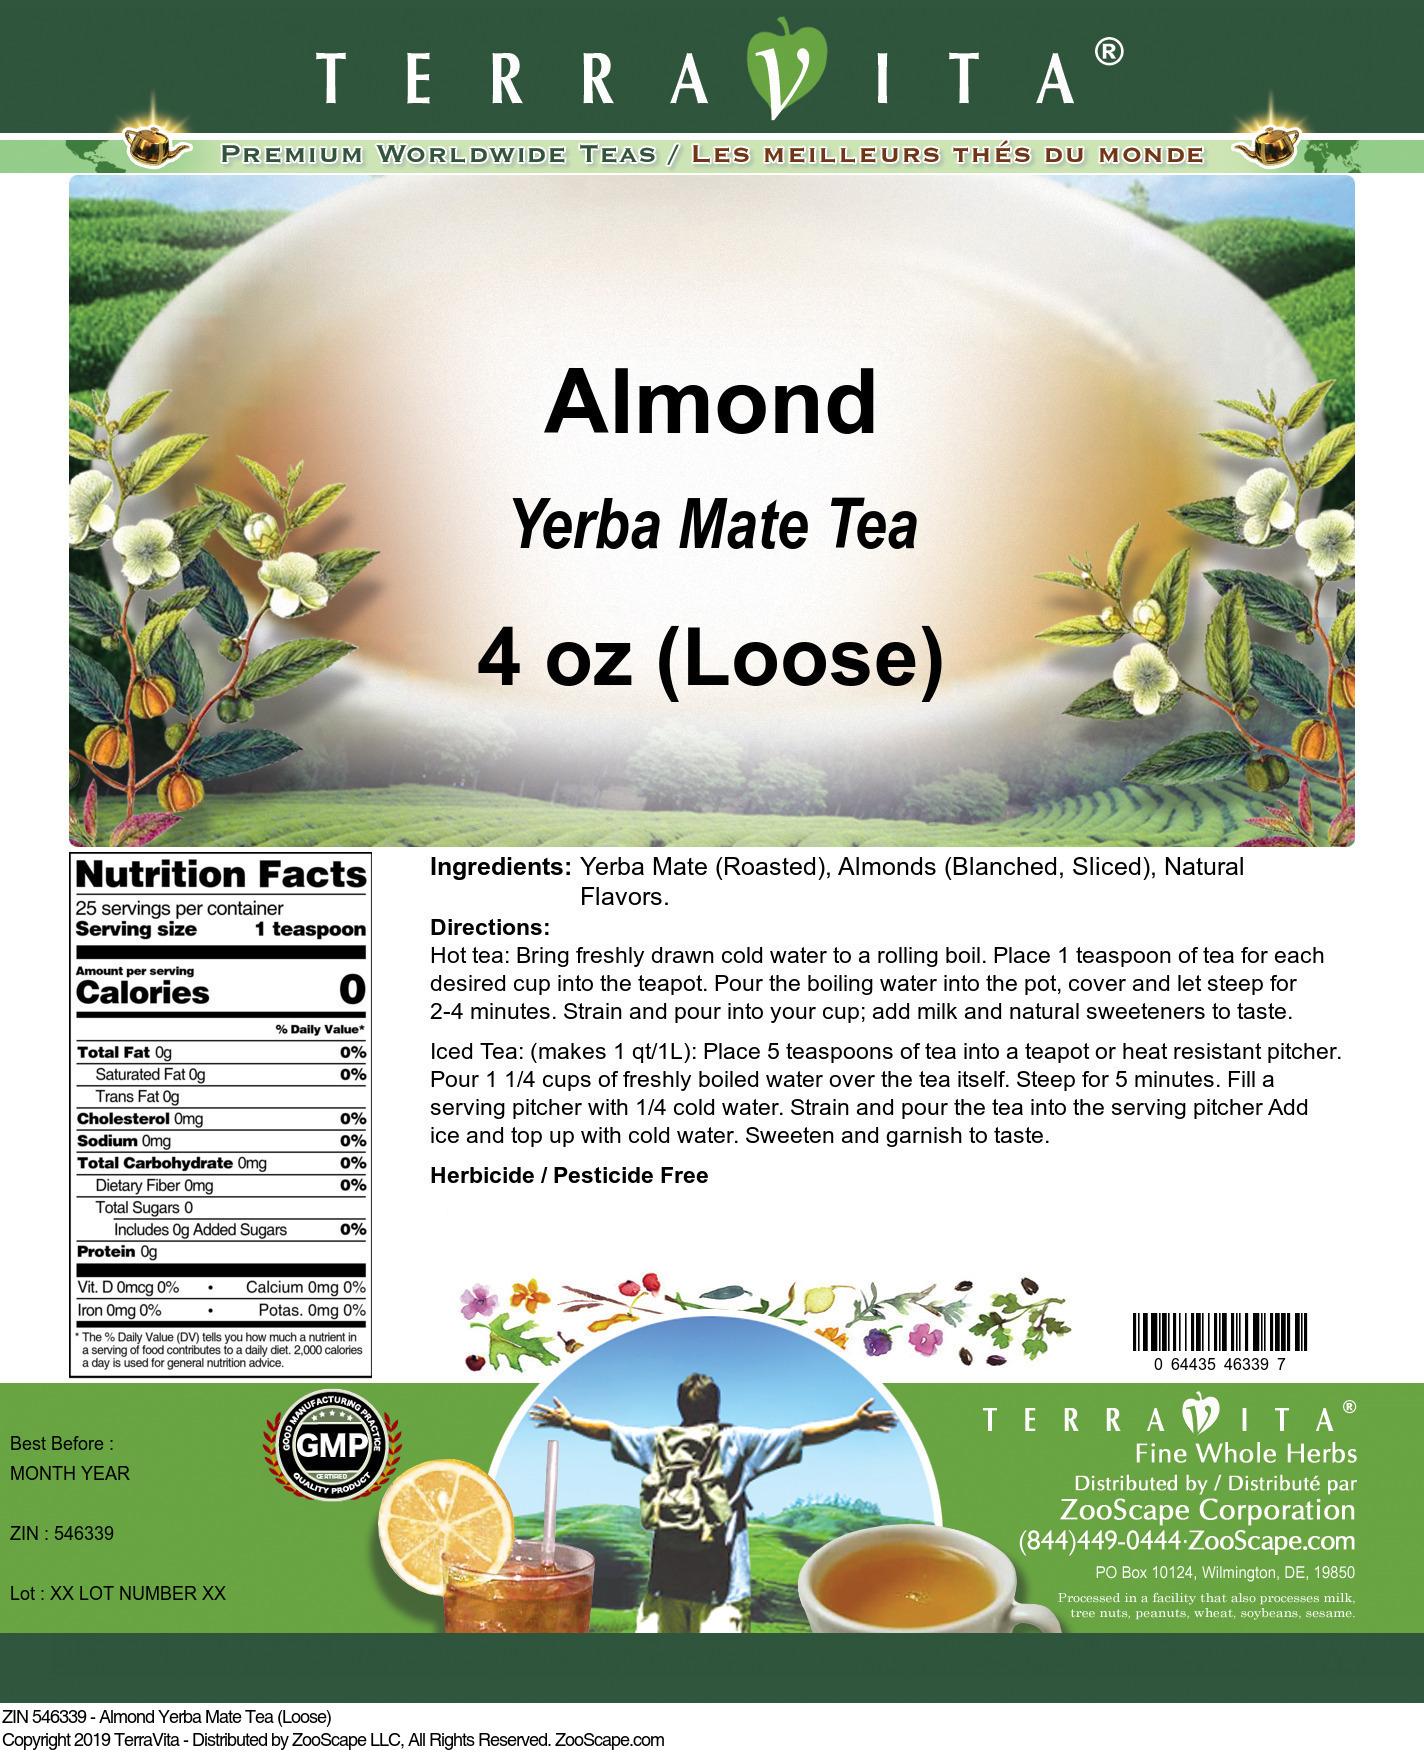 Almond Yerba Mate Tea (Loose)